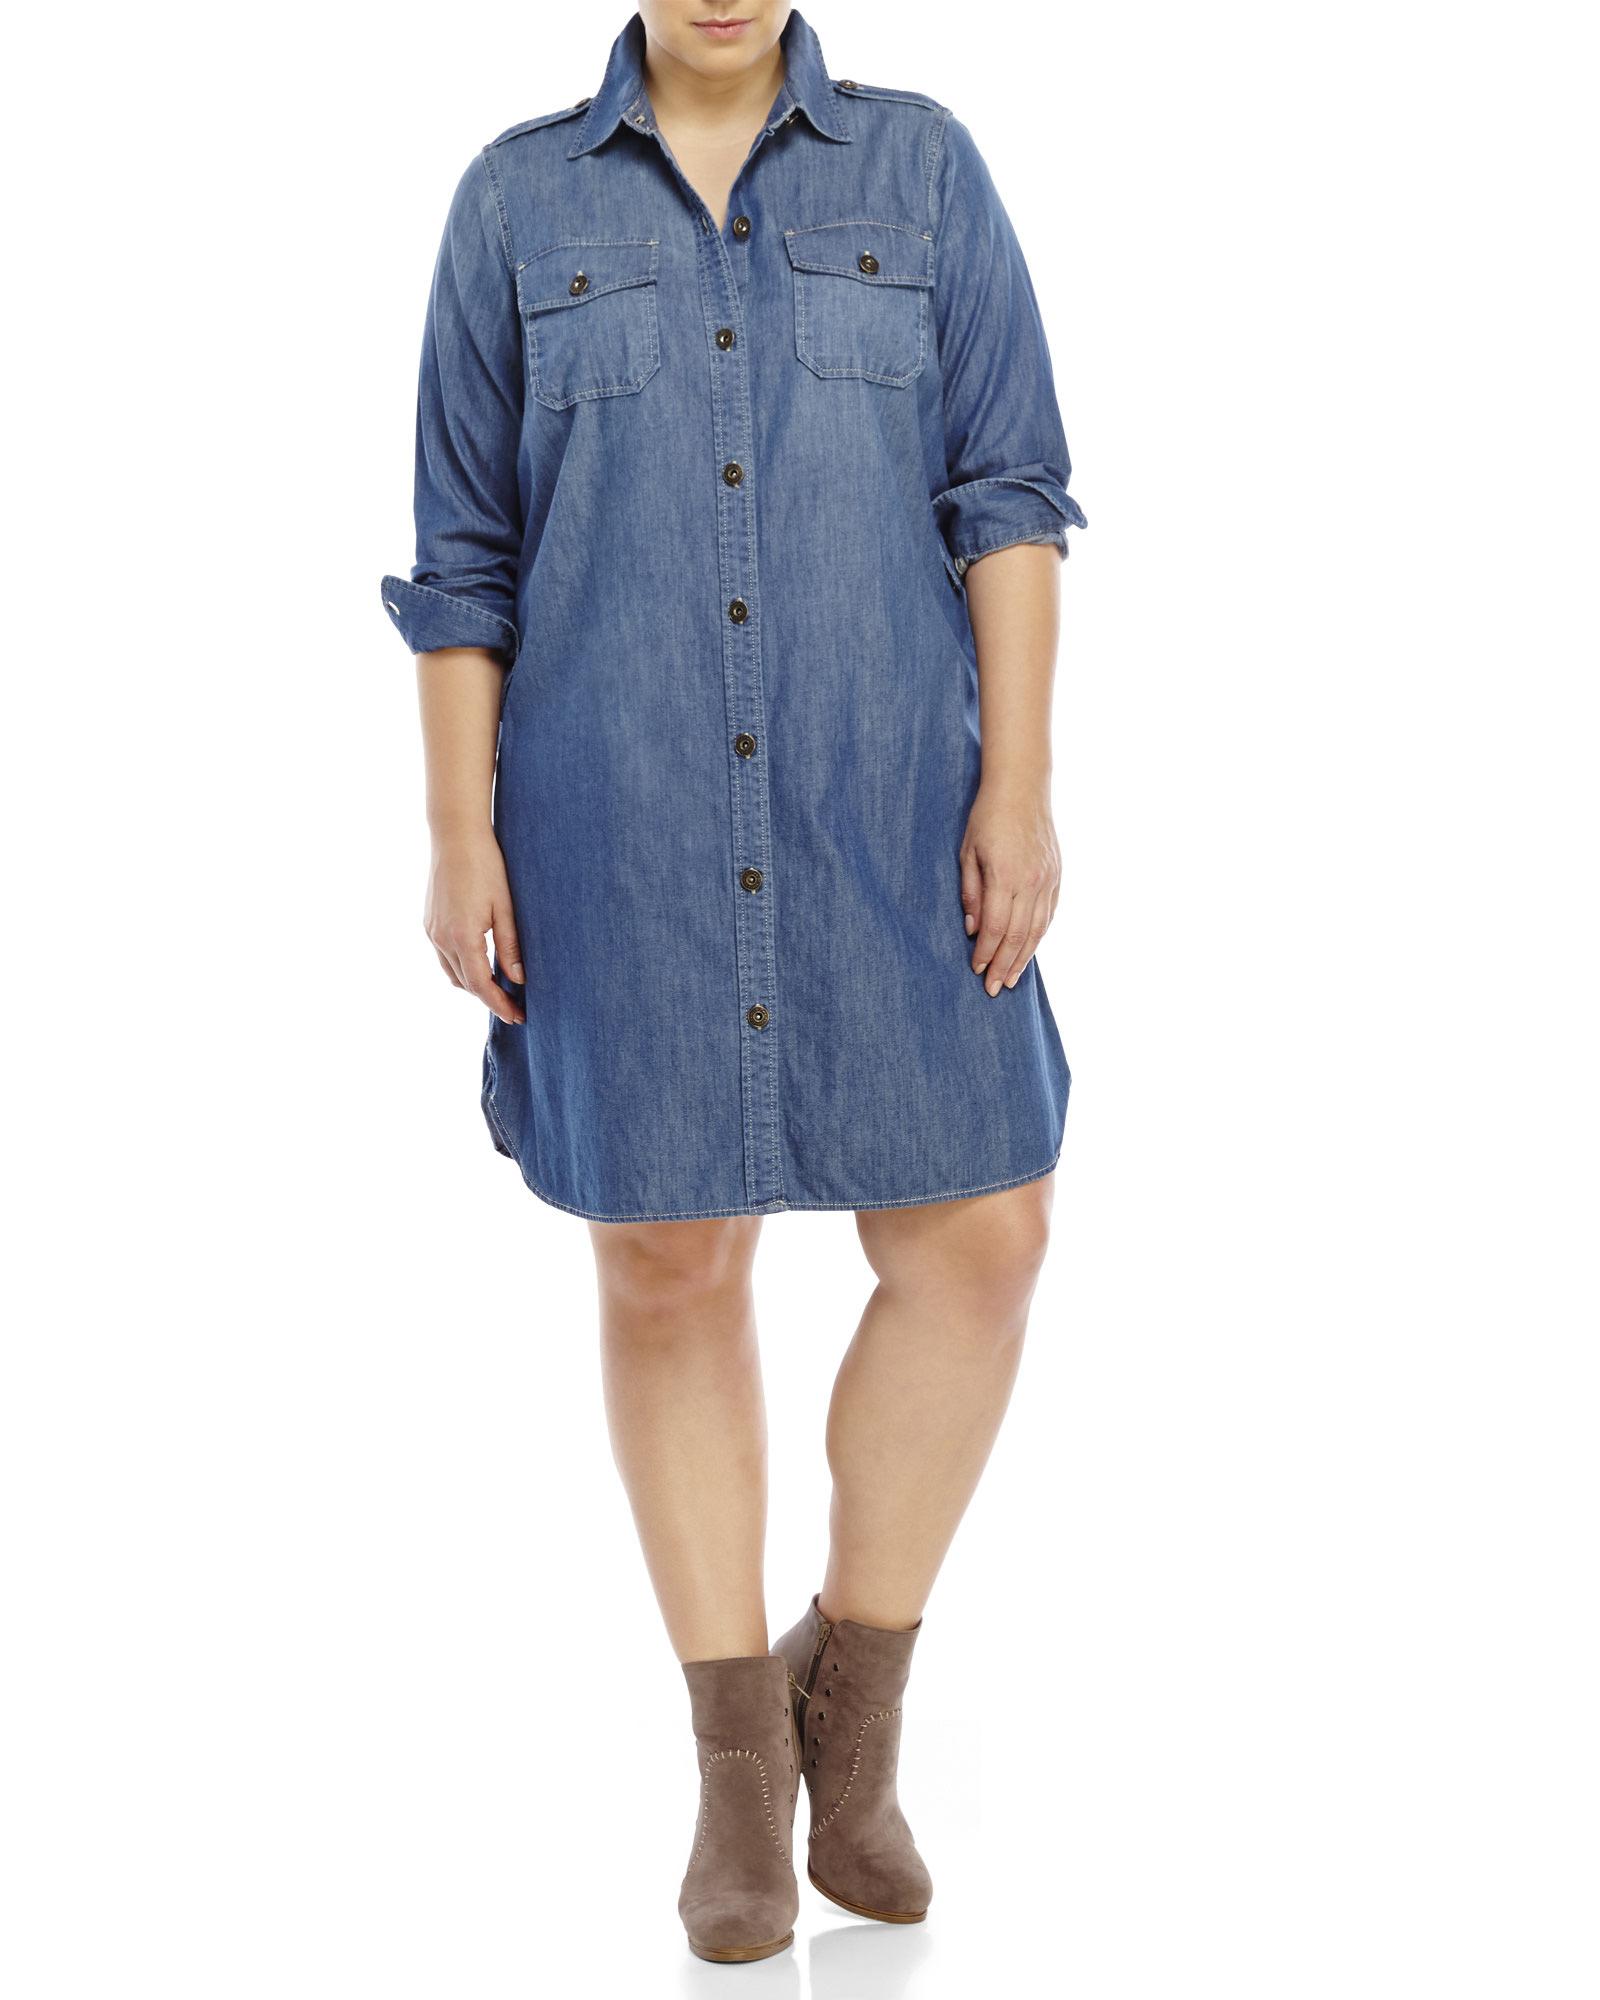 Plus Size Denim Shirtdress – DACC